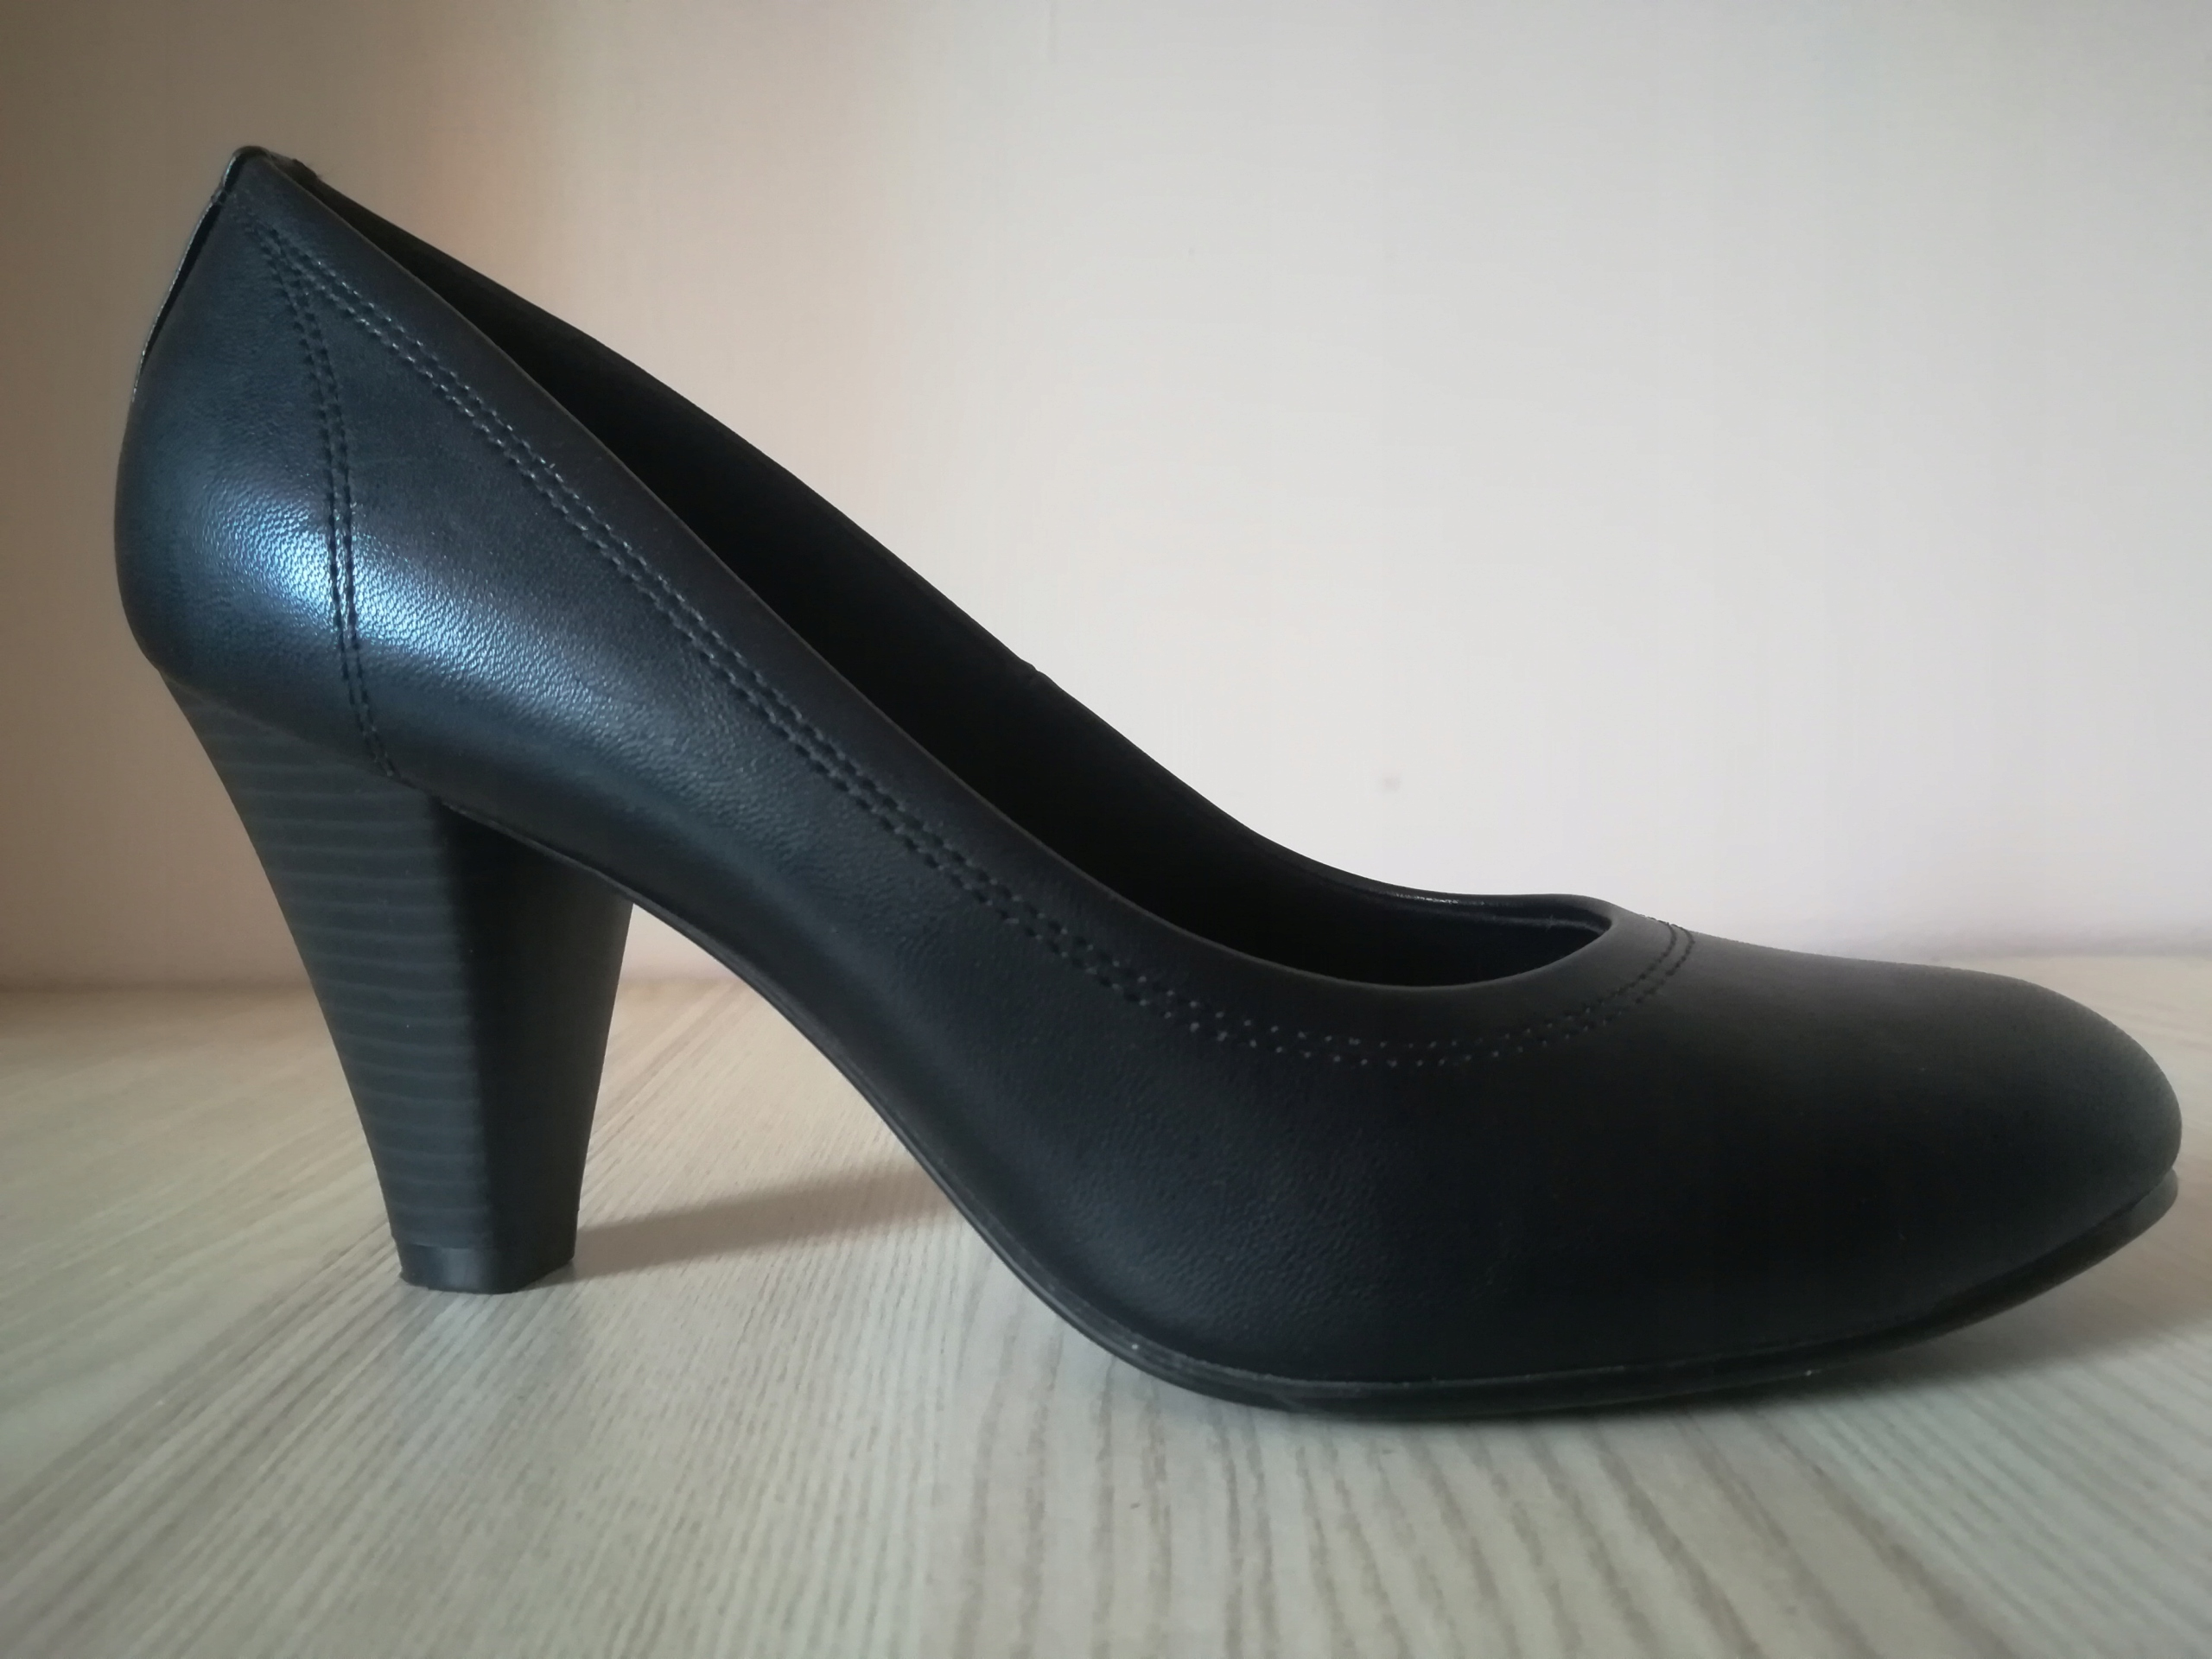 DEICHMANN czarne czółenka/pantofle na obcasie r. 3